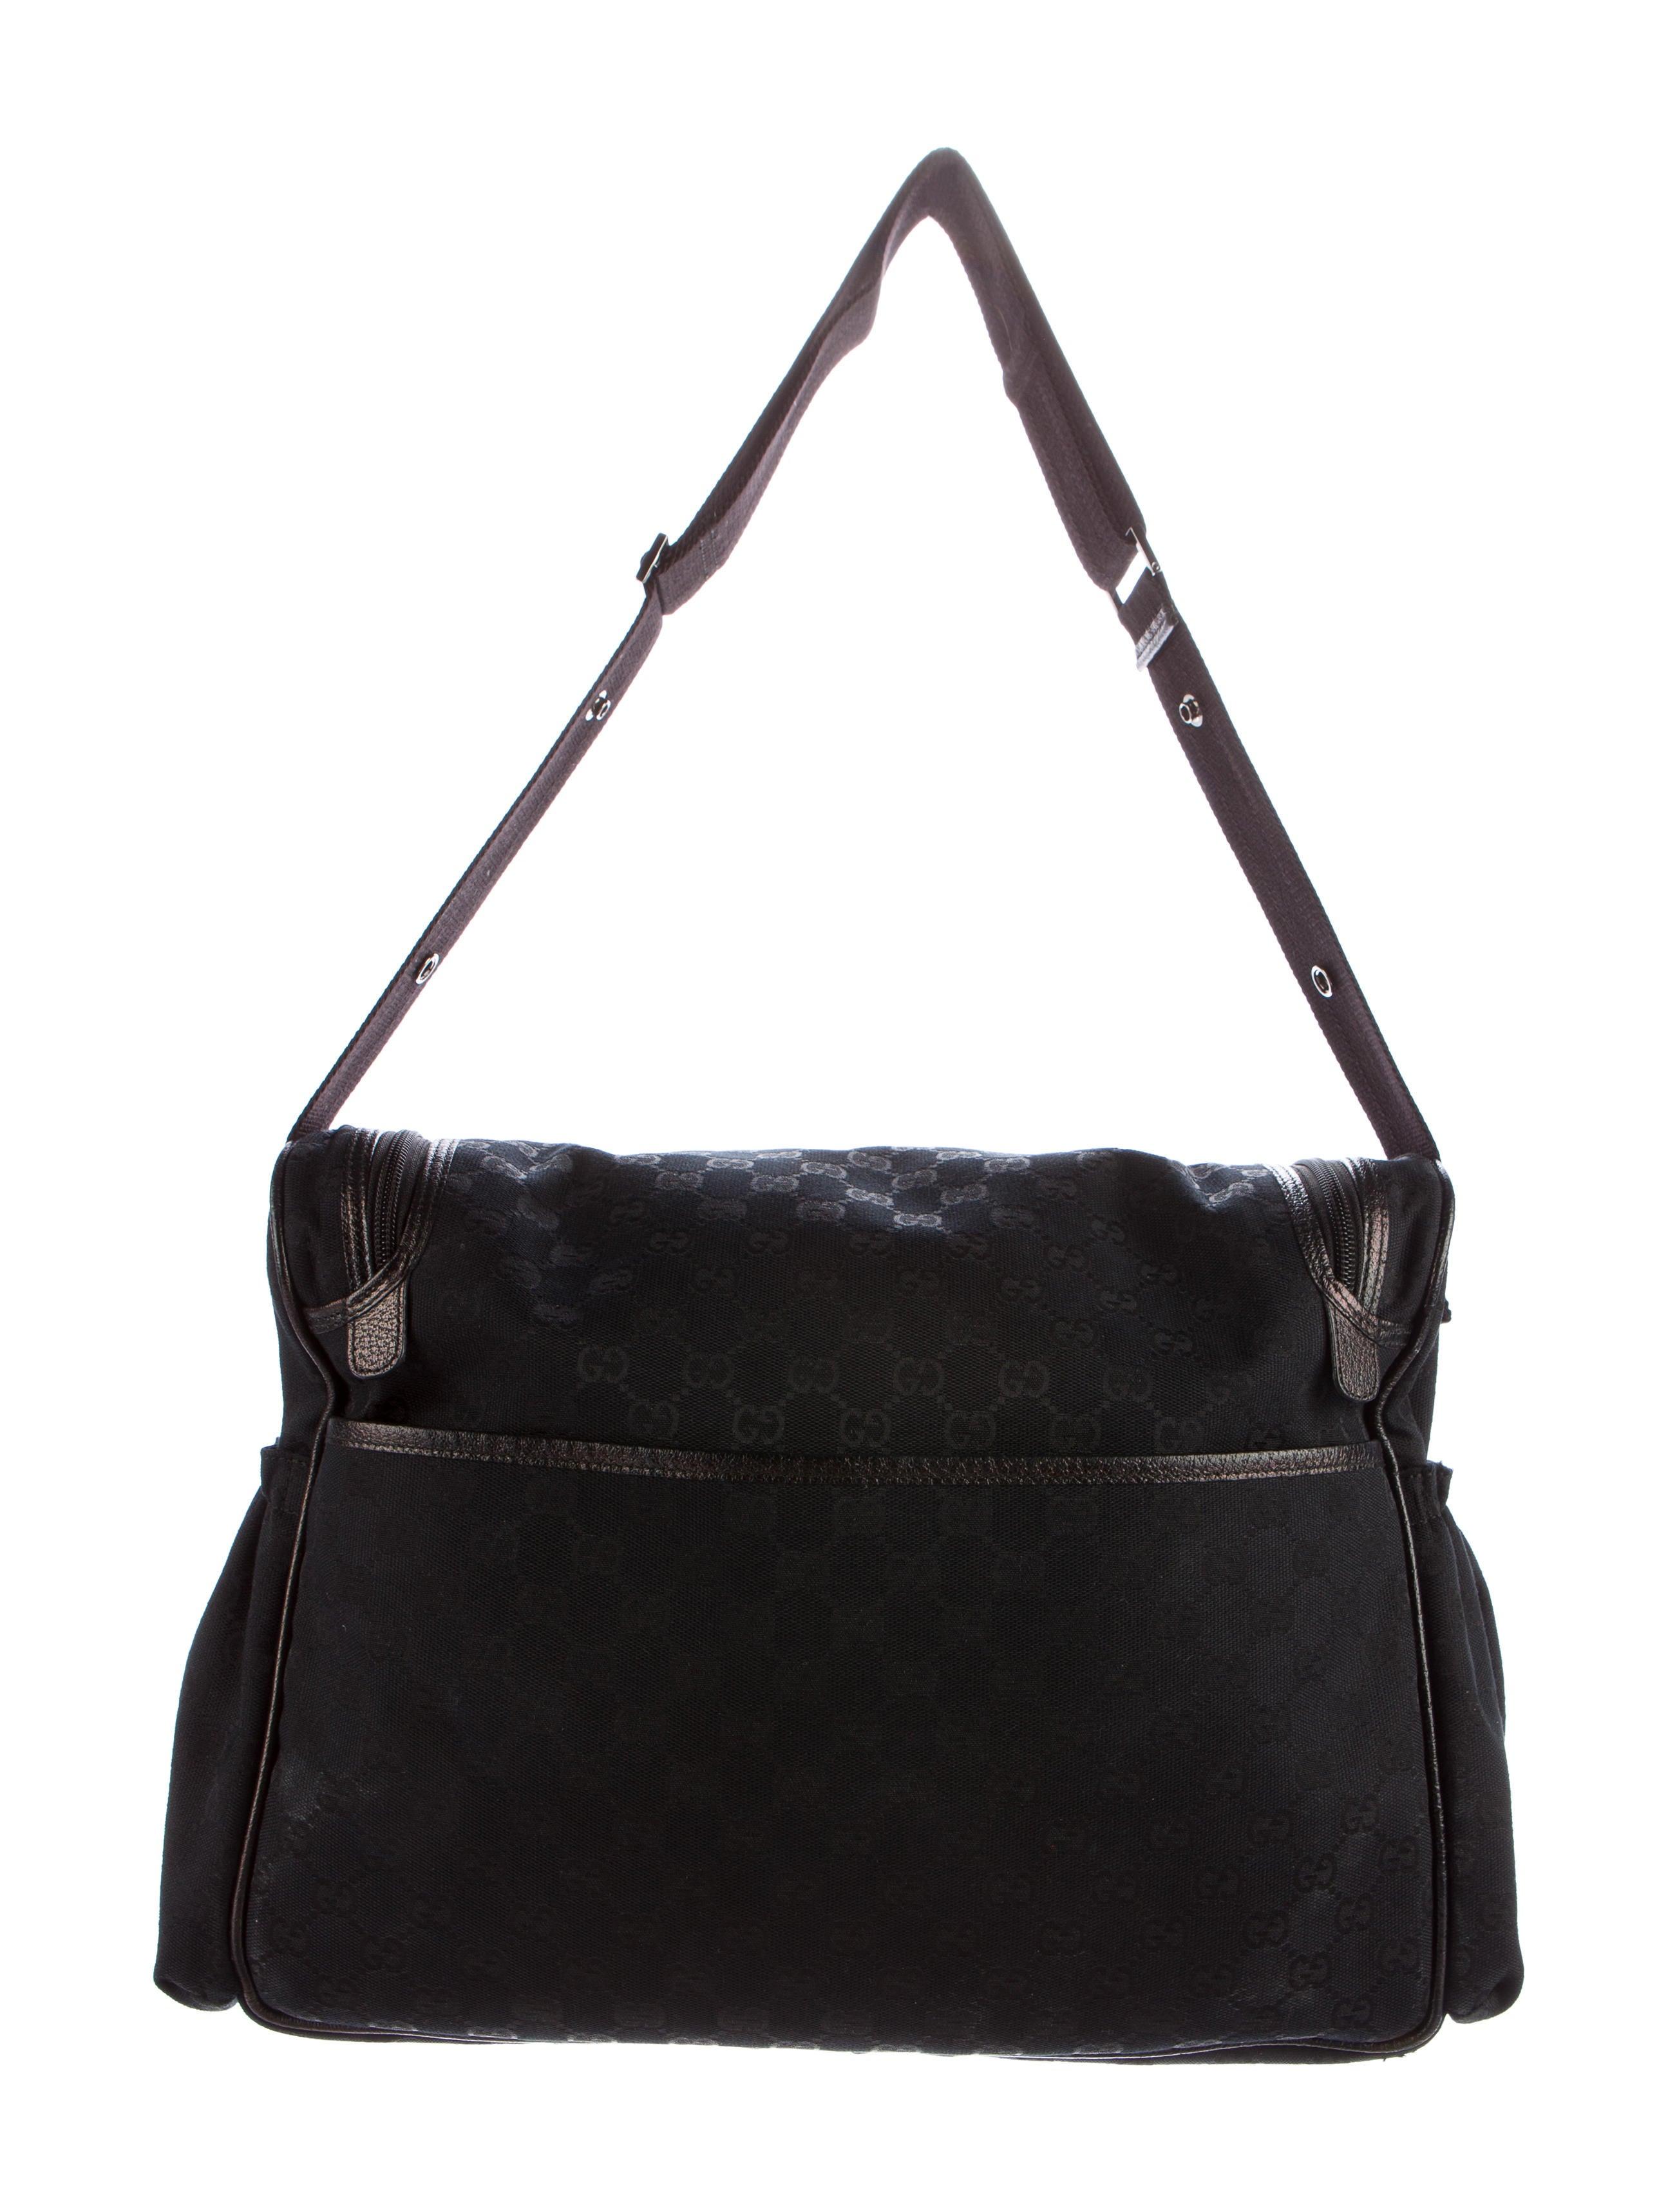 dc42d639e2fd Diaper Bags Under 25. mayoral engraved leatherette diaper bag navy ...